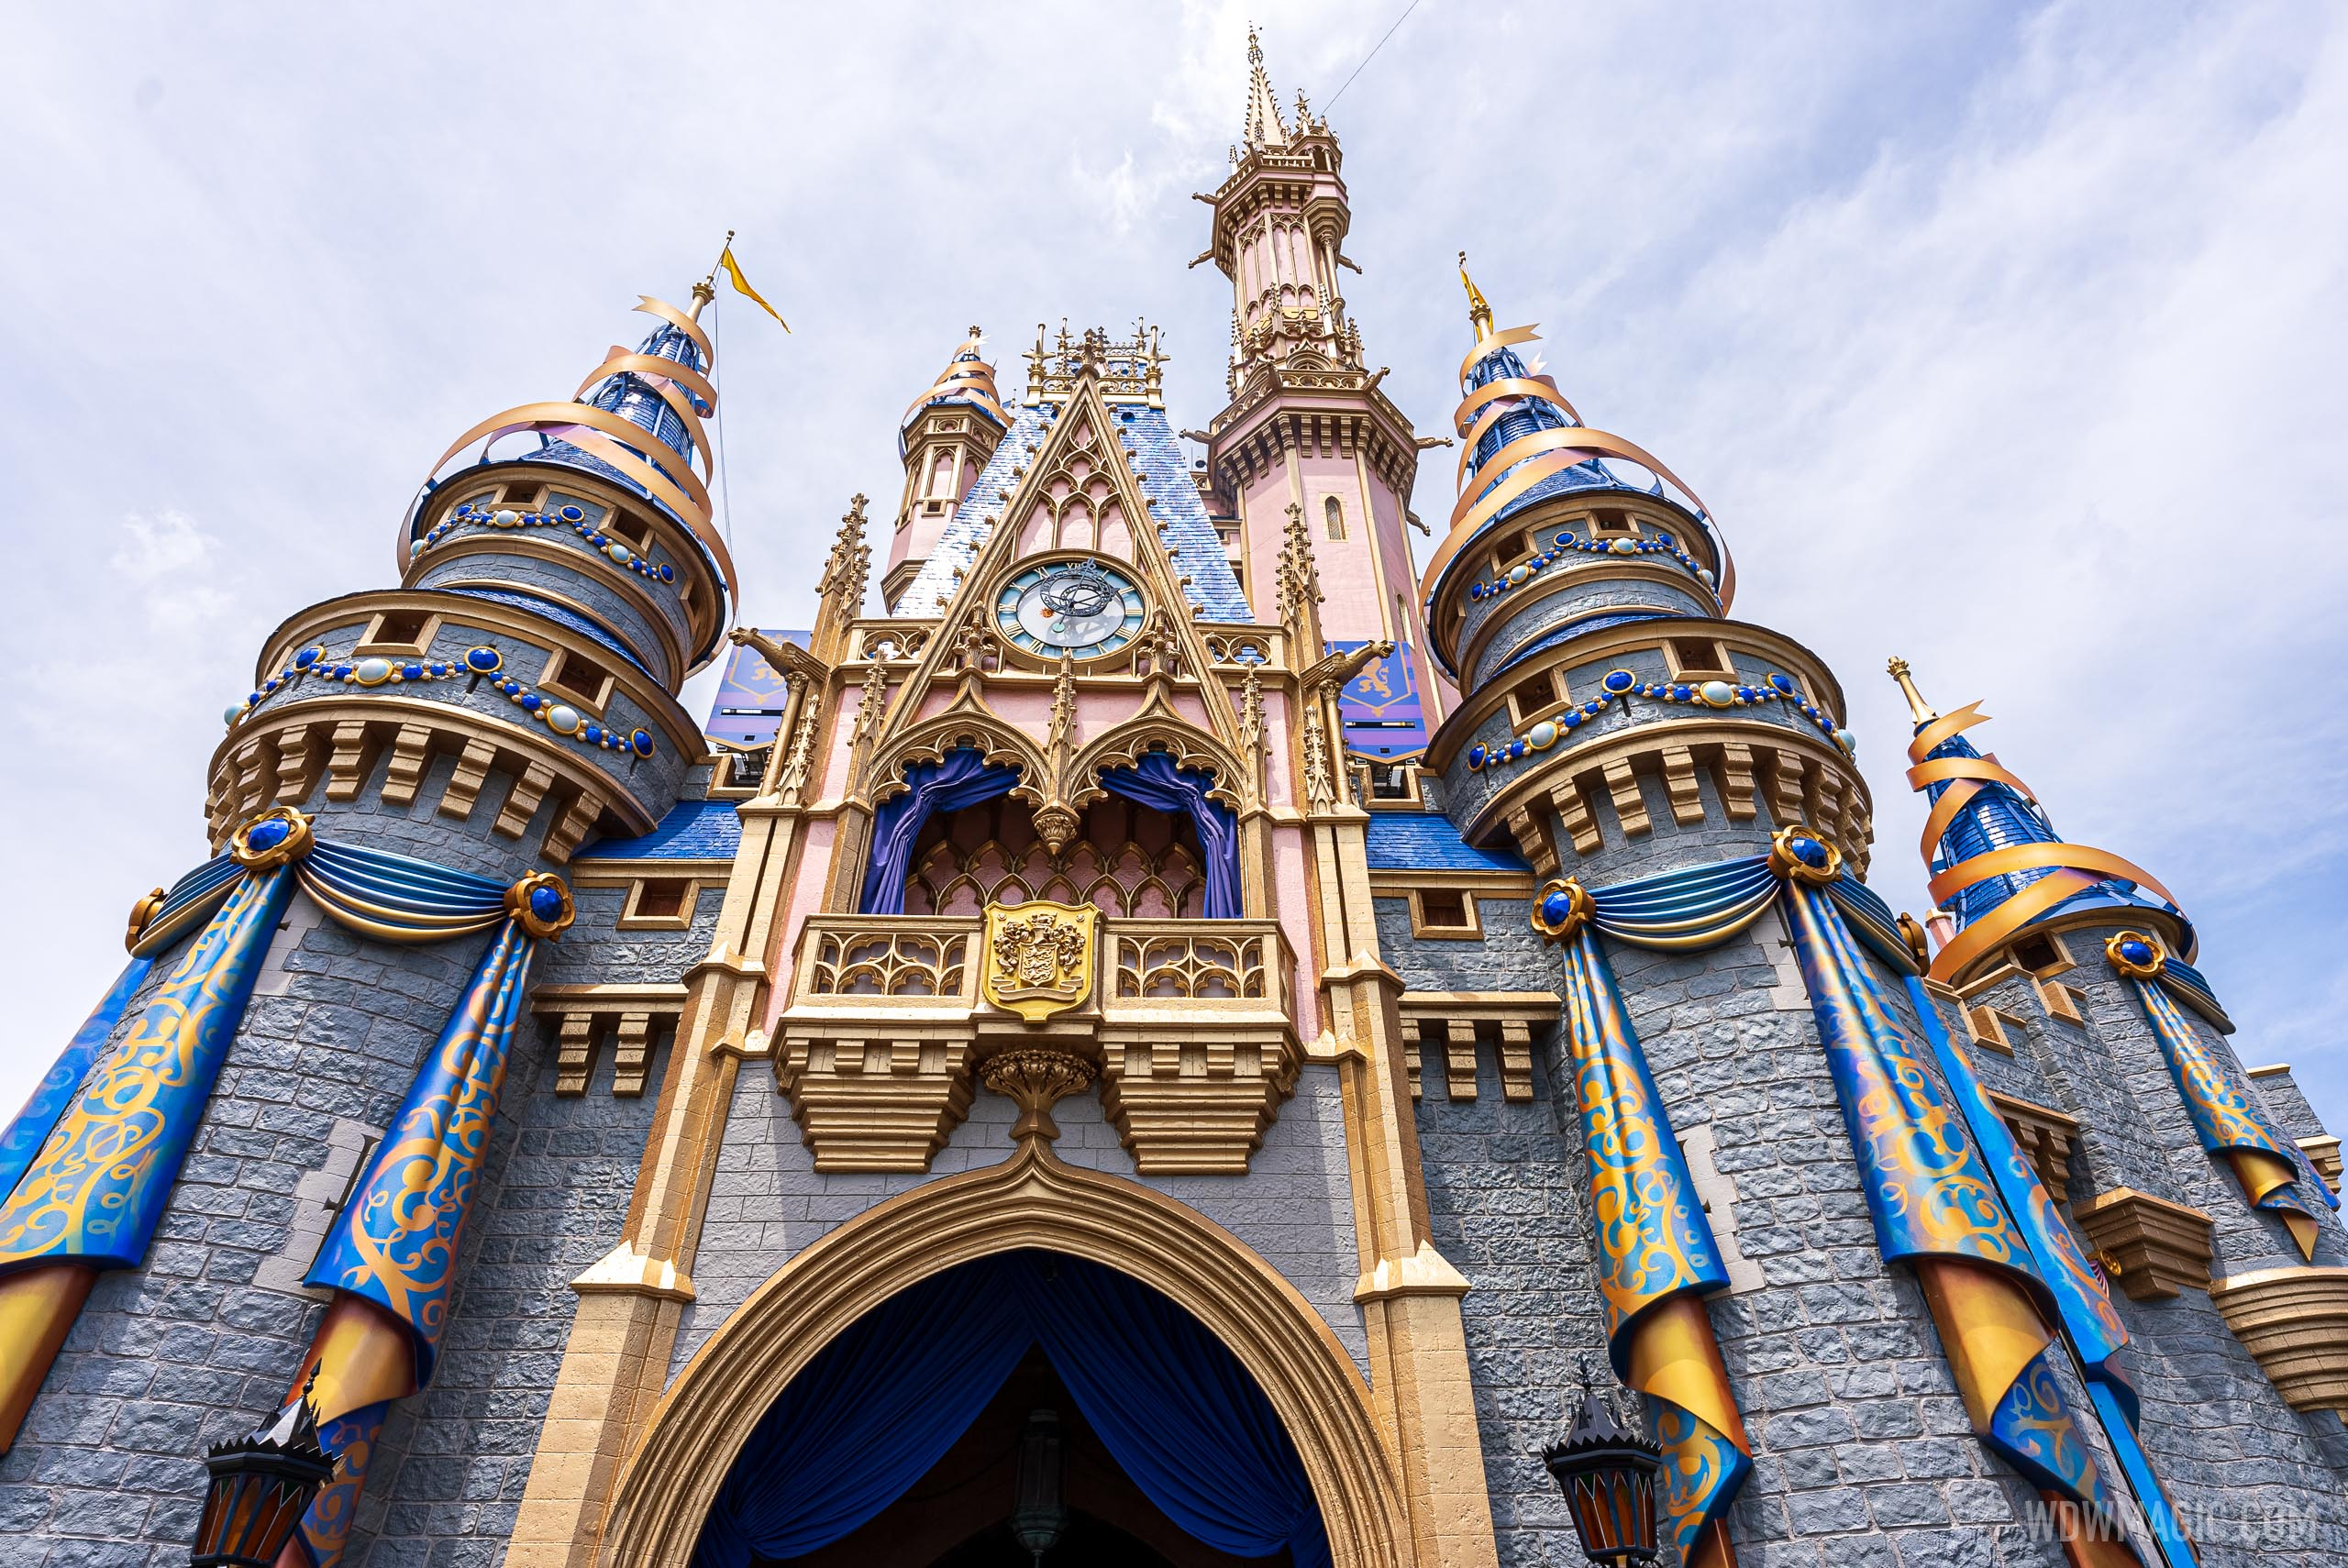 Walt Disney World will begin its 50th celebrations on October 1 2021